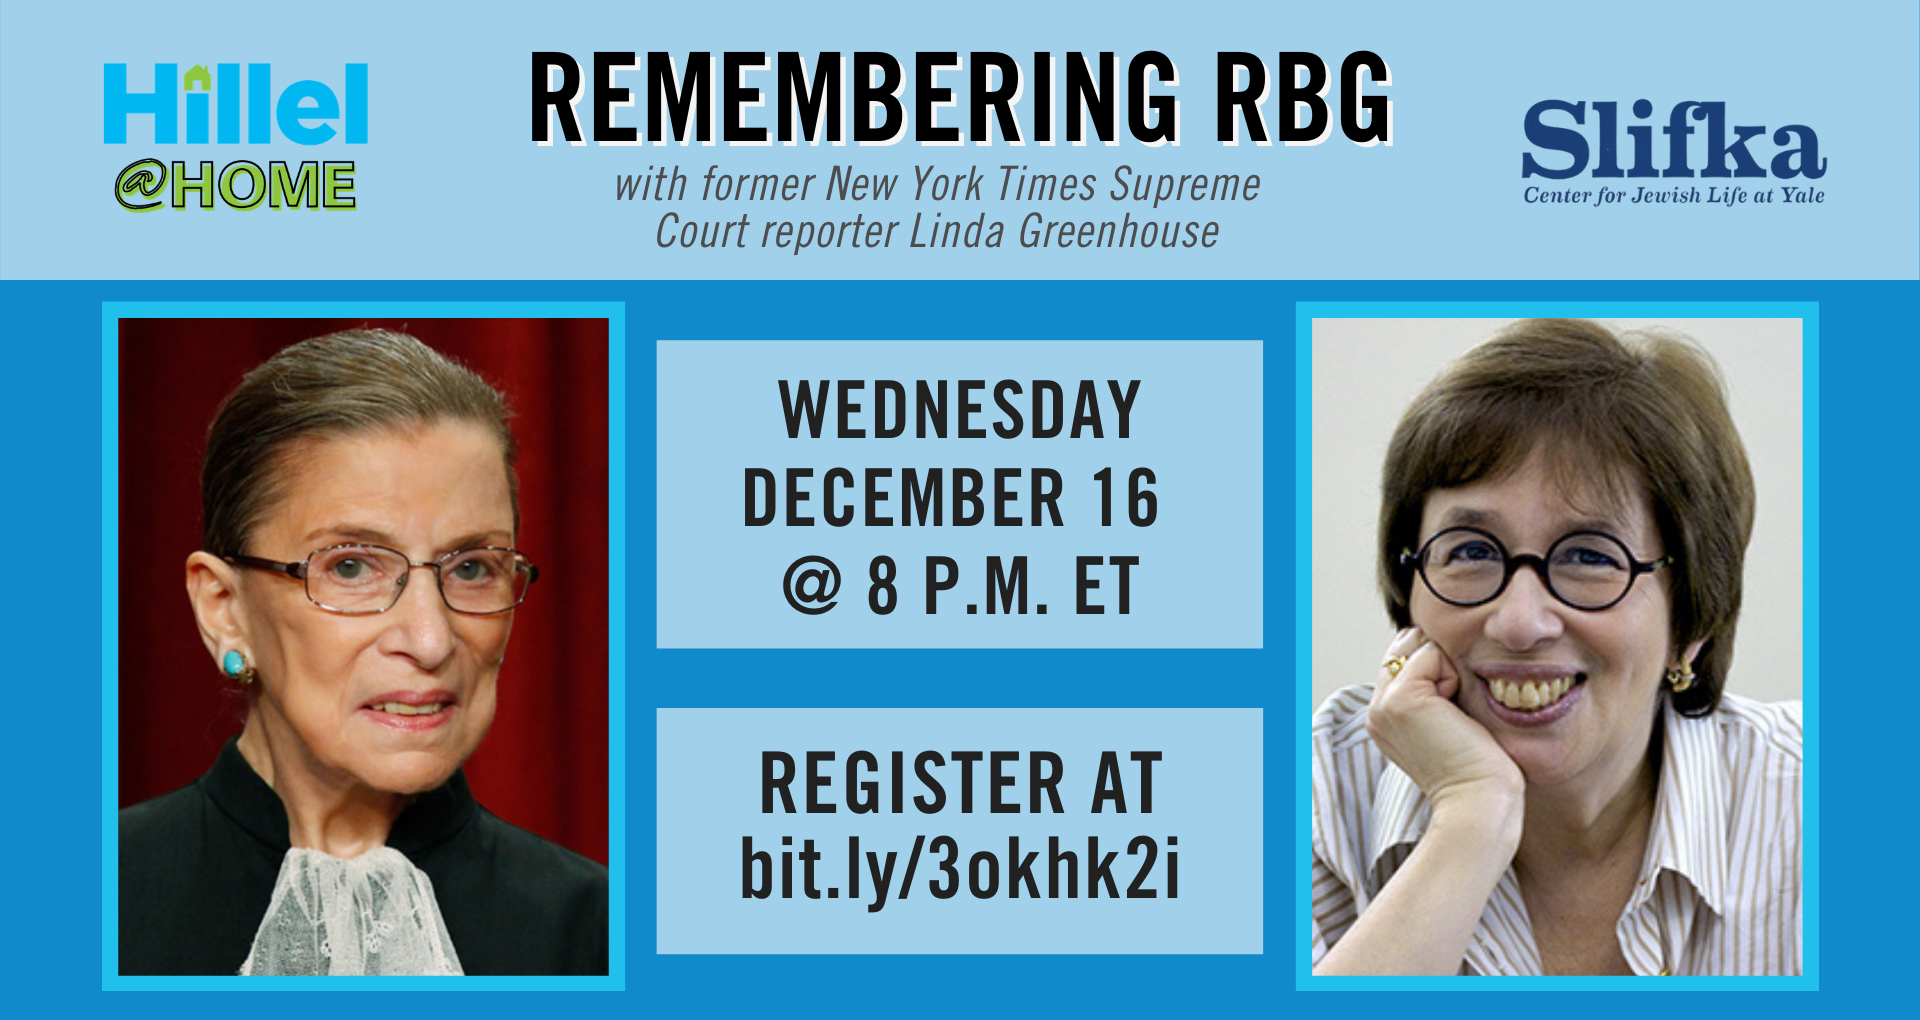 Remembering RBG